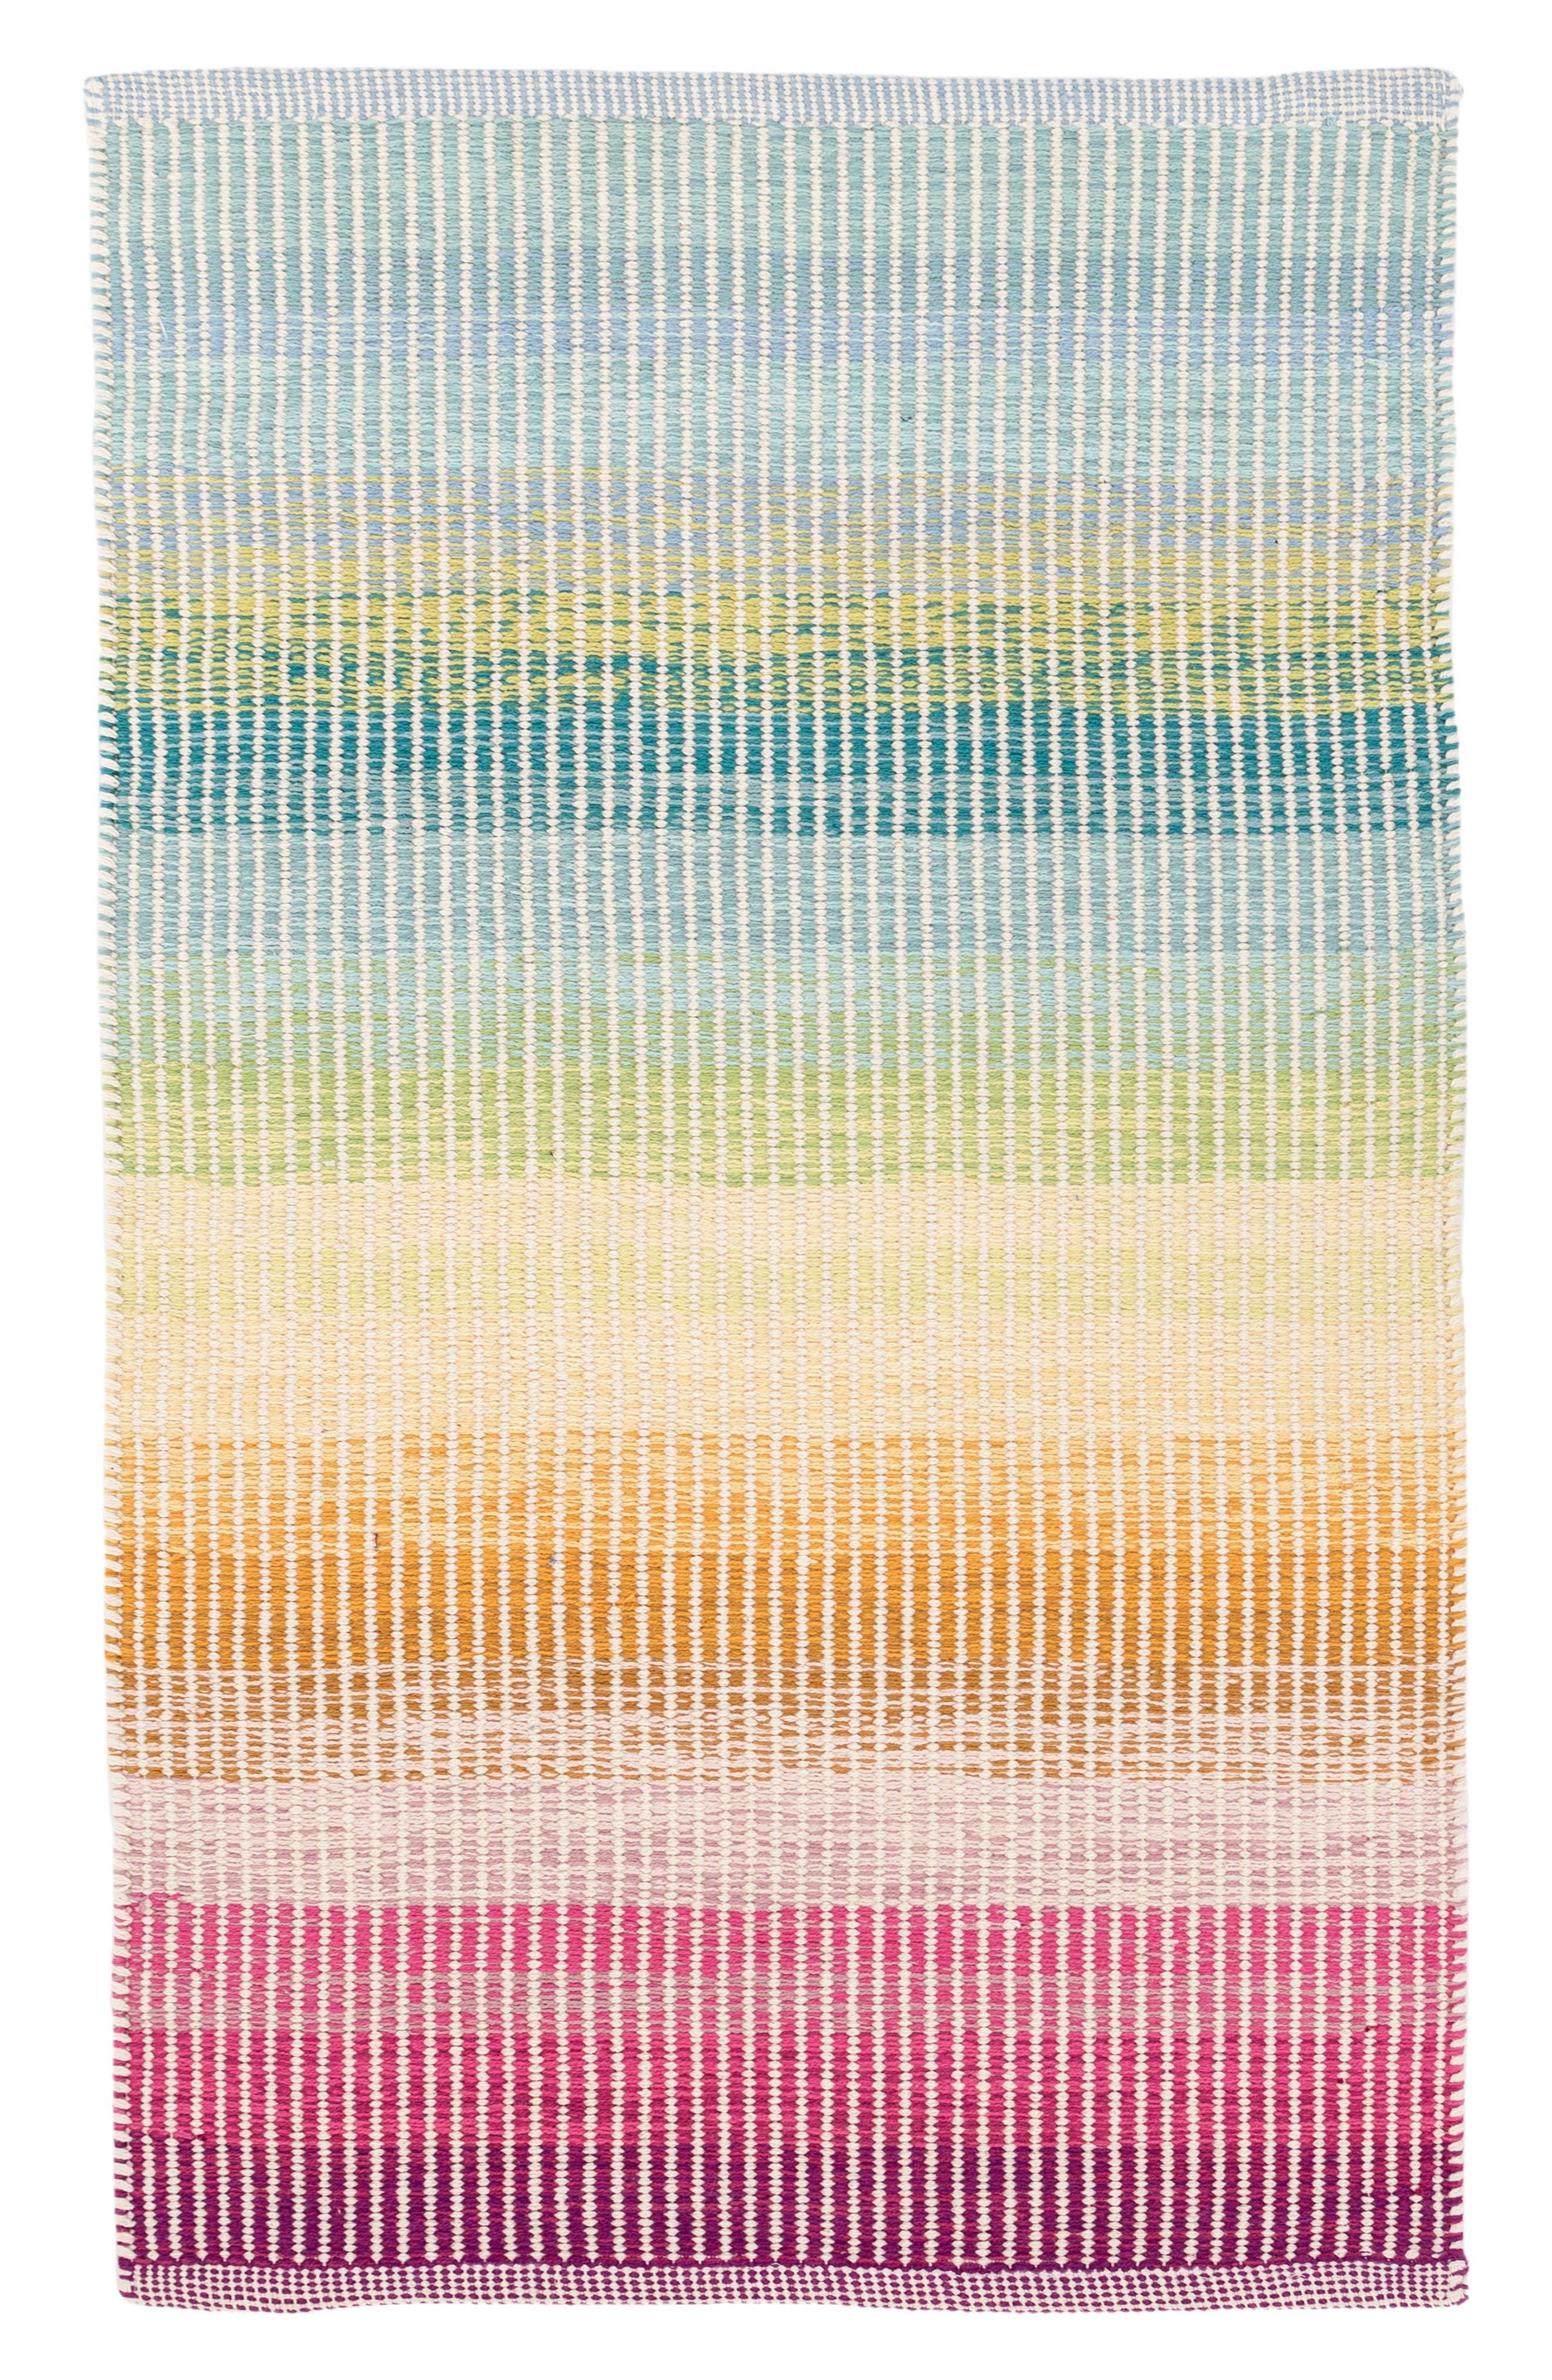 Watercolor Horizon Handwoven Cotton Rug,                         Main,                         color, Blue